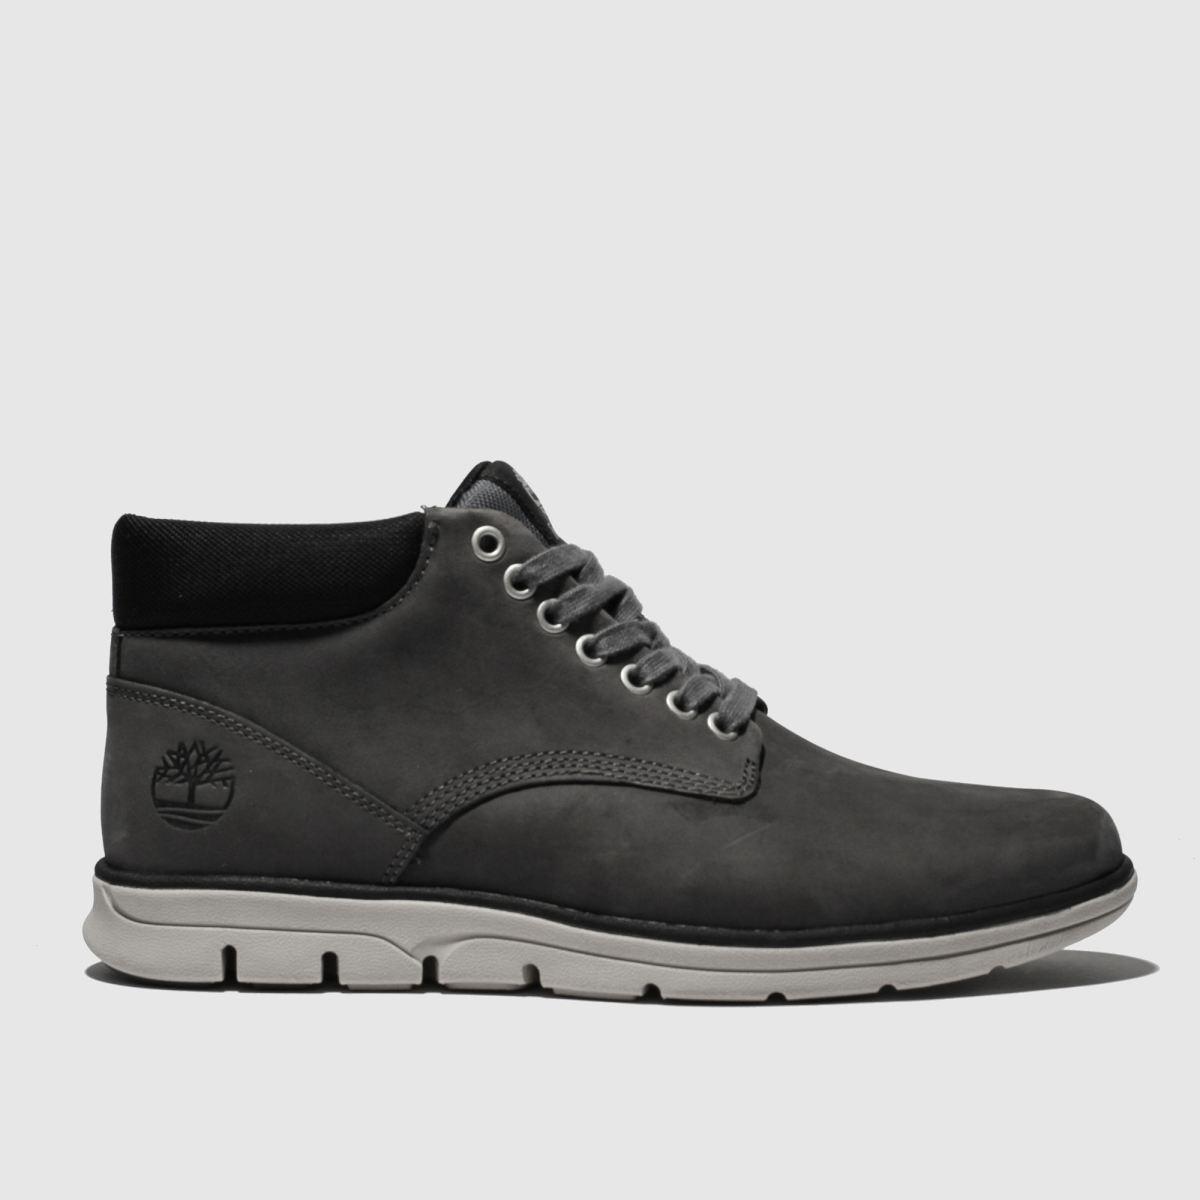 Timberland Grey & Black Bradstreet Chukka Boots